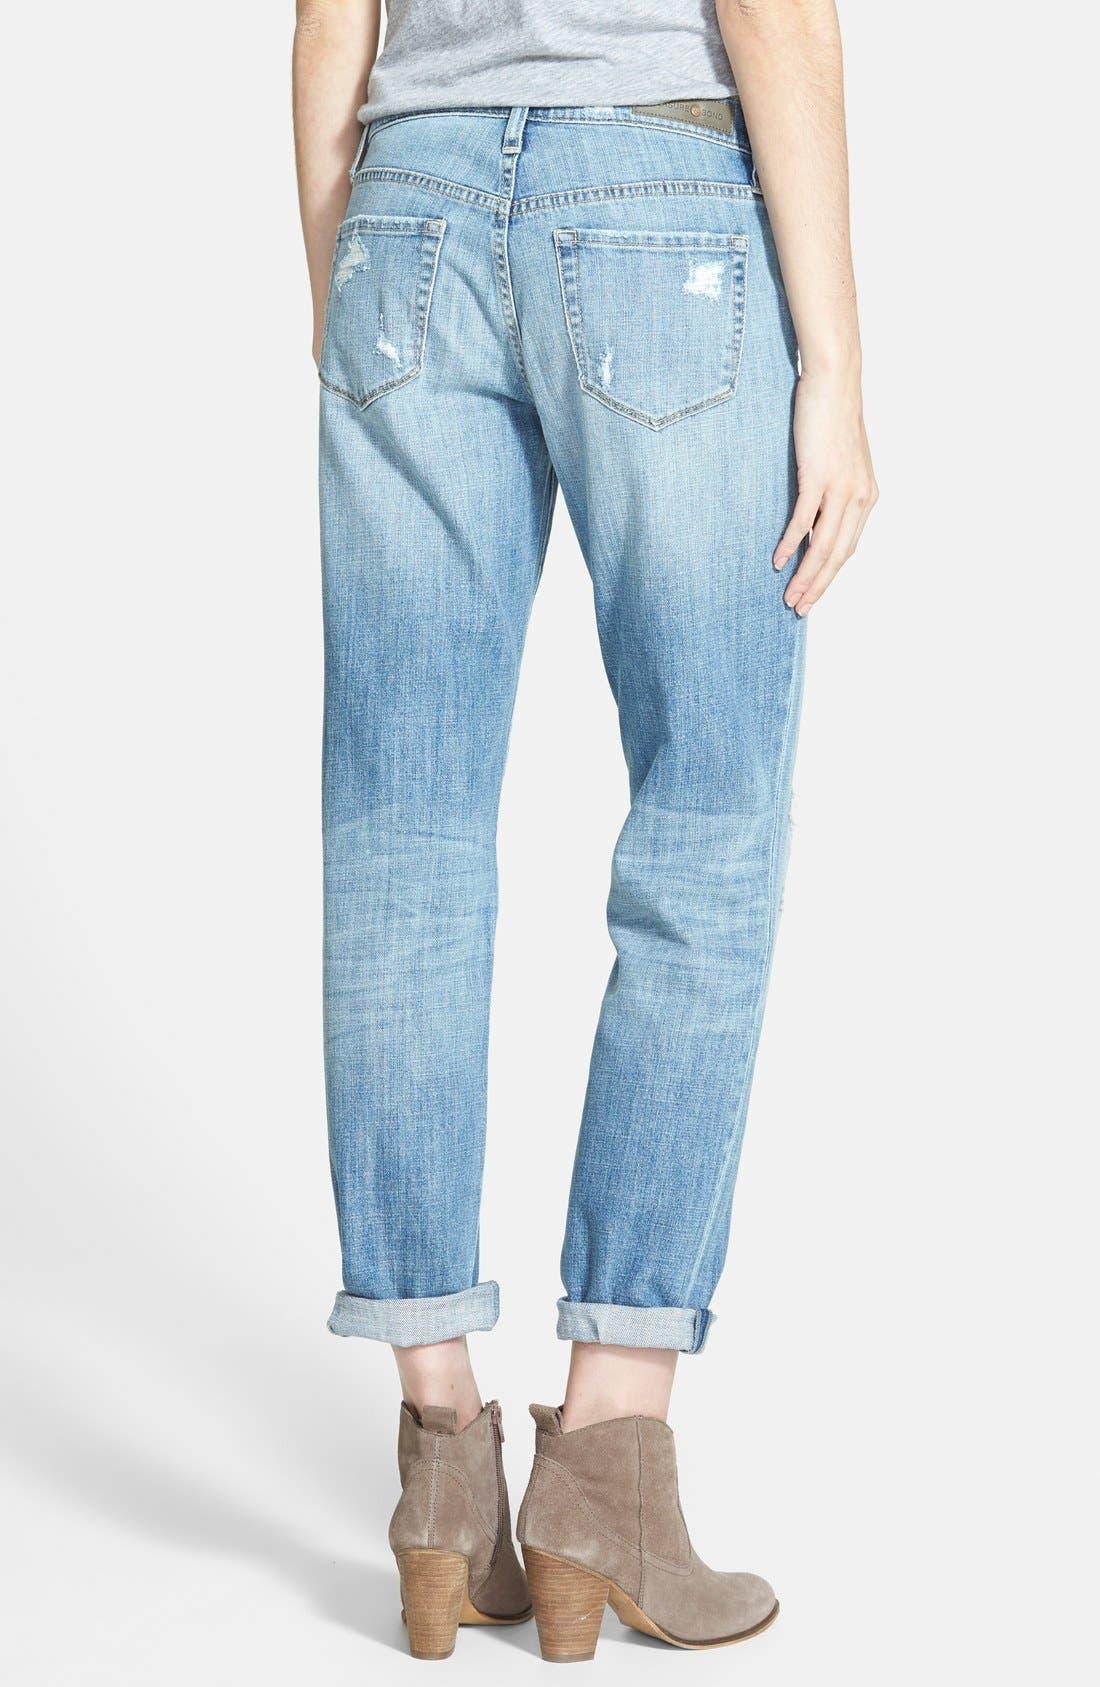 Alternate Image 2  - Treasure&Bond Destructed Boyfriend Jeans (Blue Jay Light Rip & Repair)